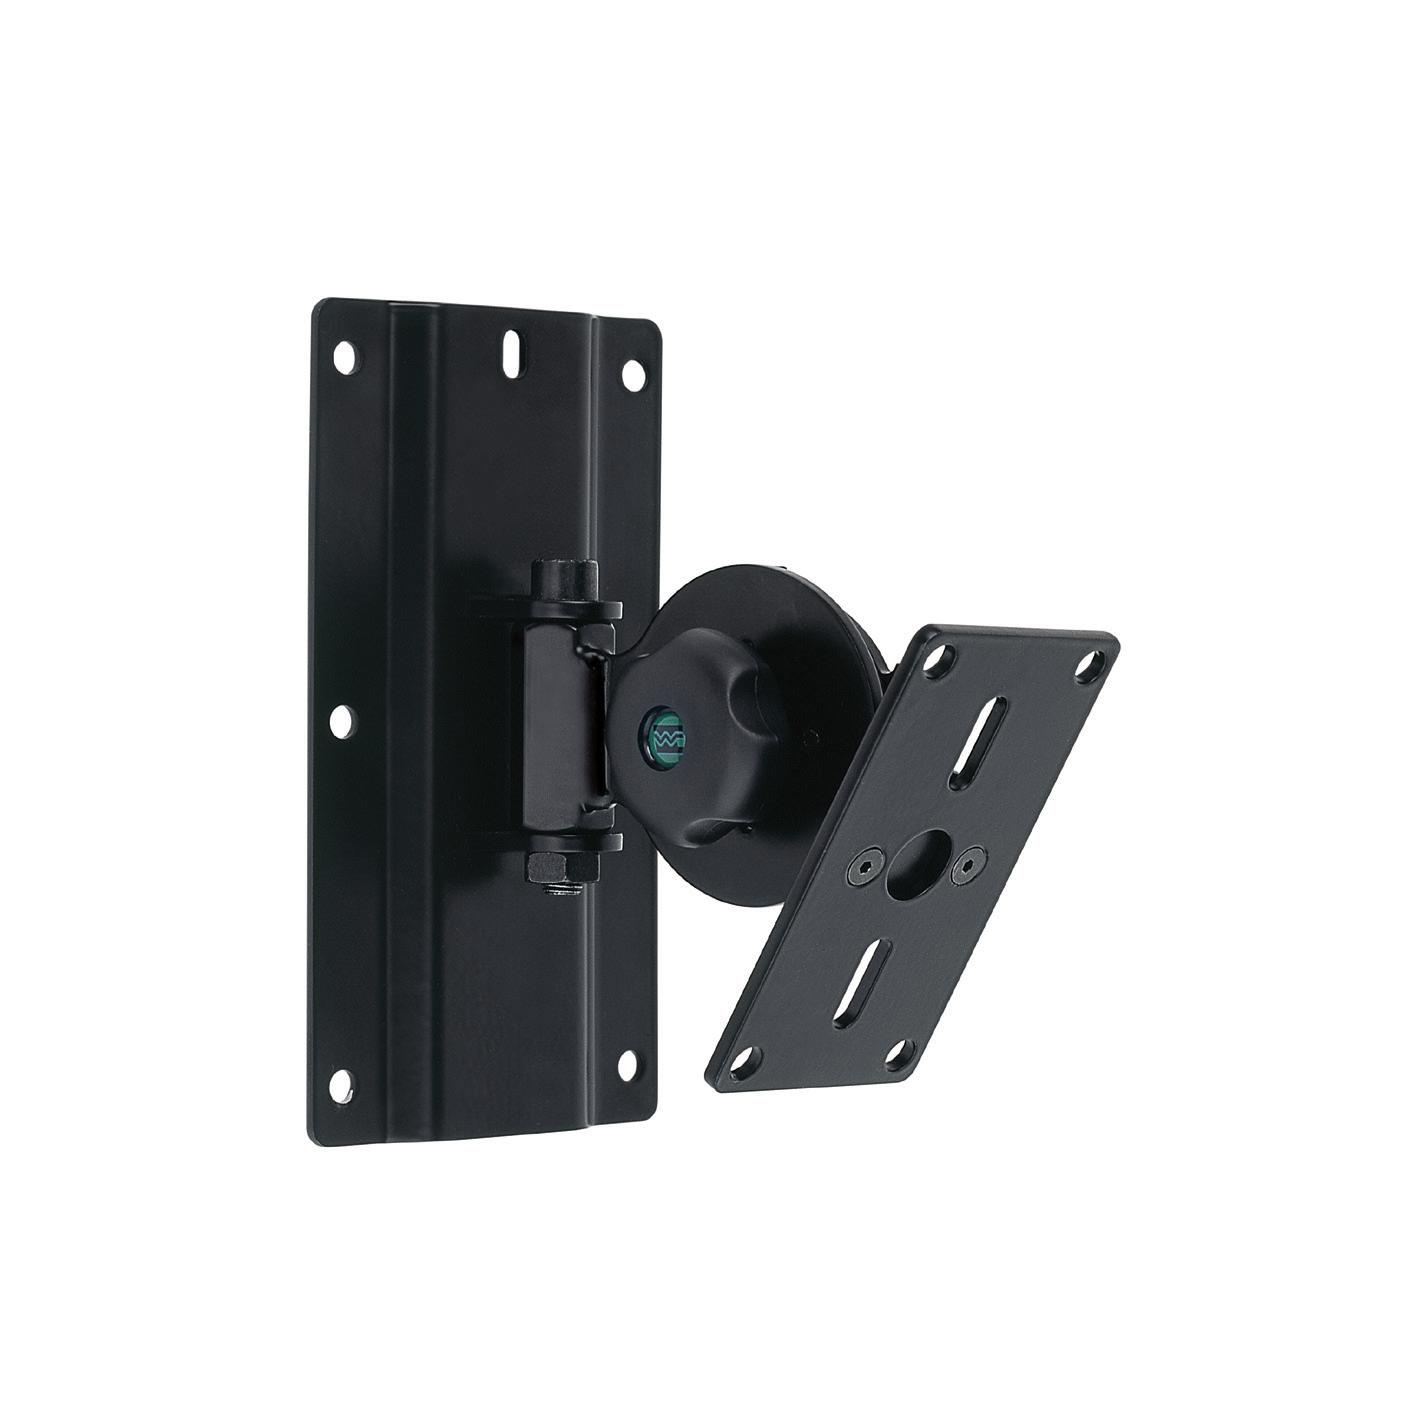 Wall Mount Speaker Bracket Adjustable And Ro Table Ral